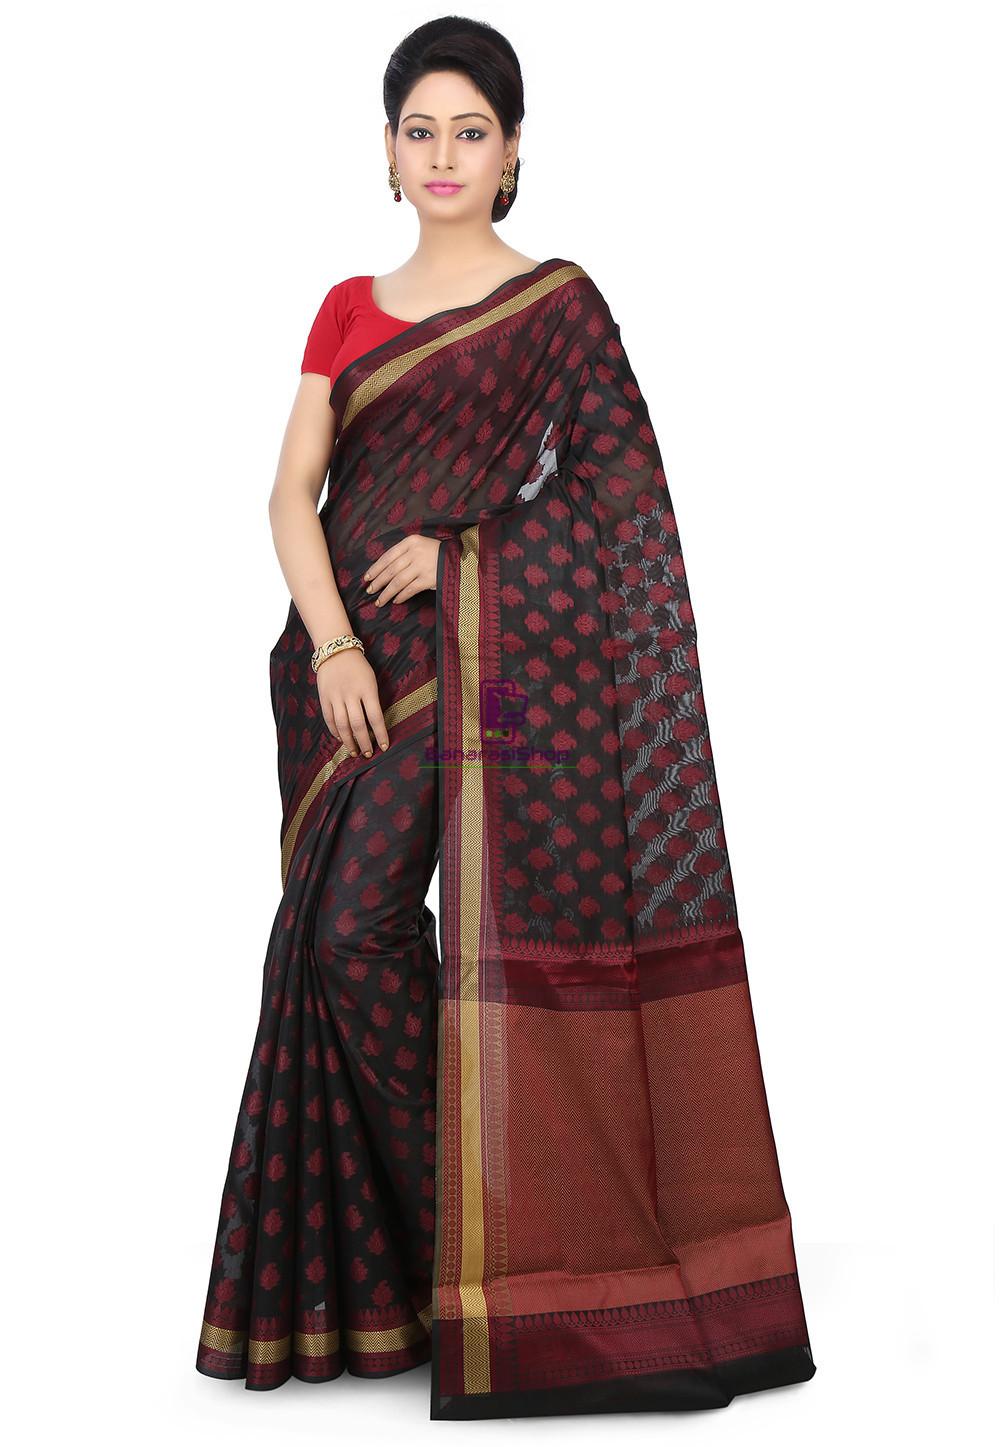 Woven Banarasi Chanderi Silk Saree in Black 1